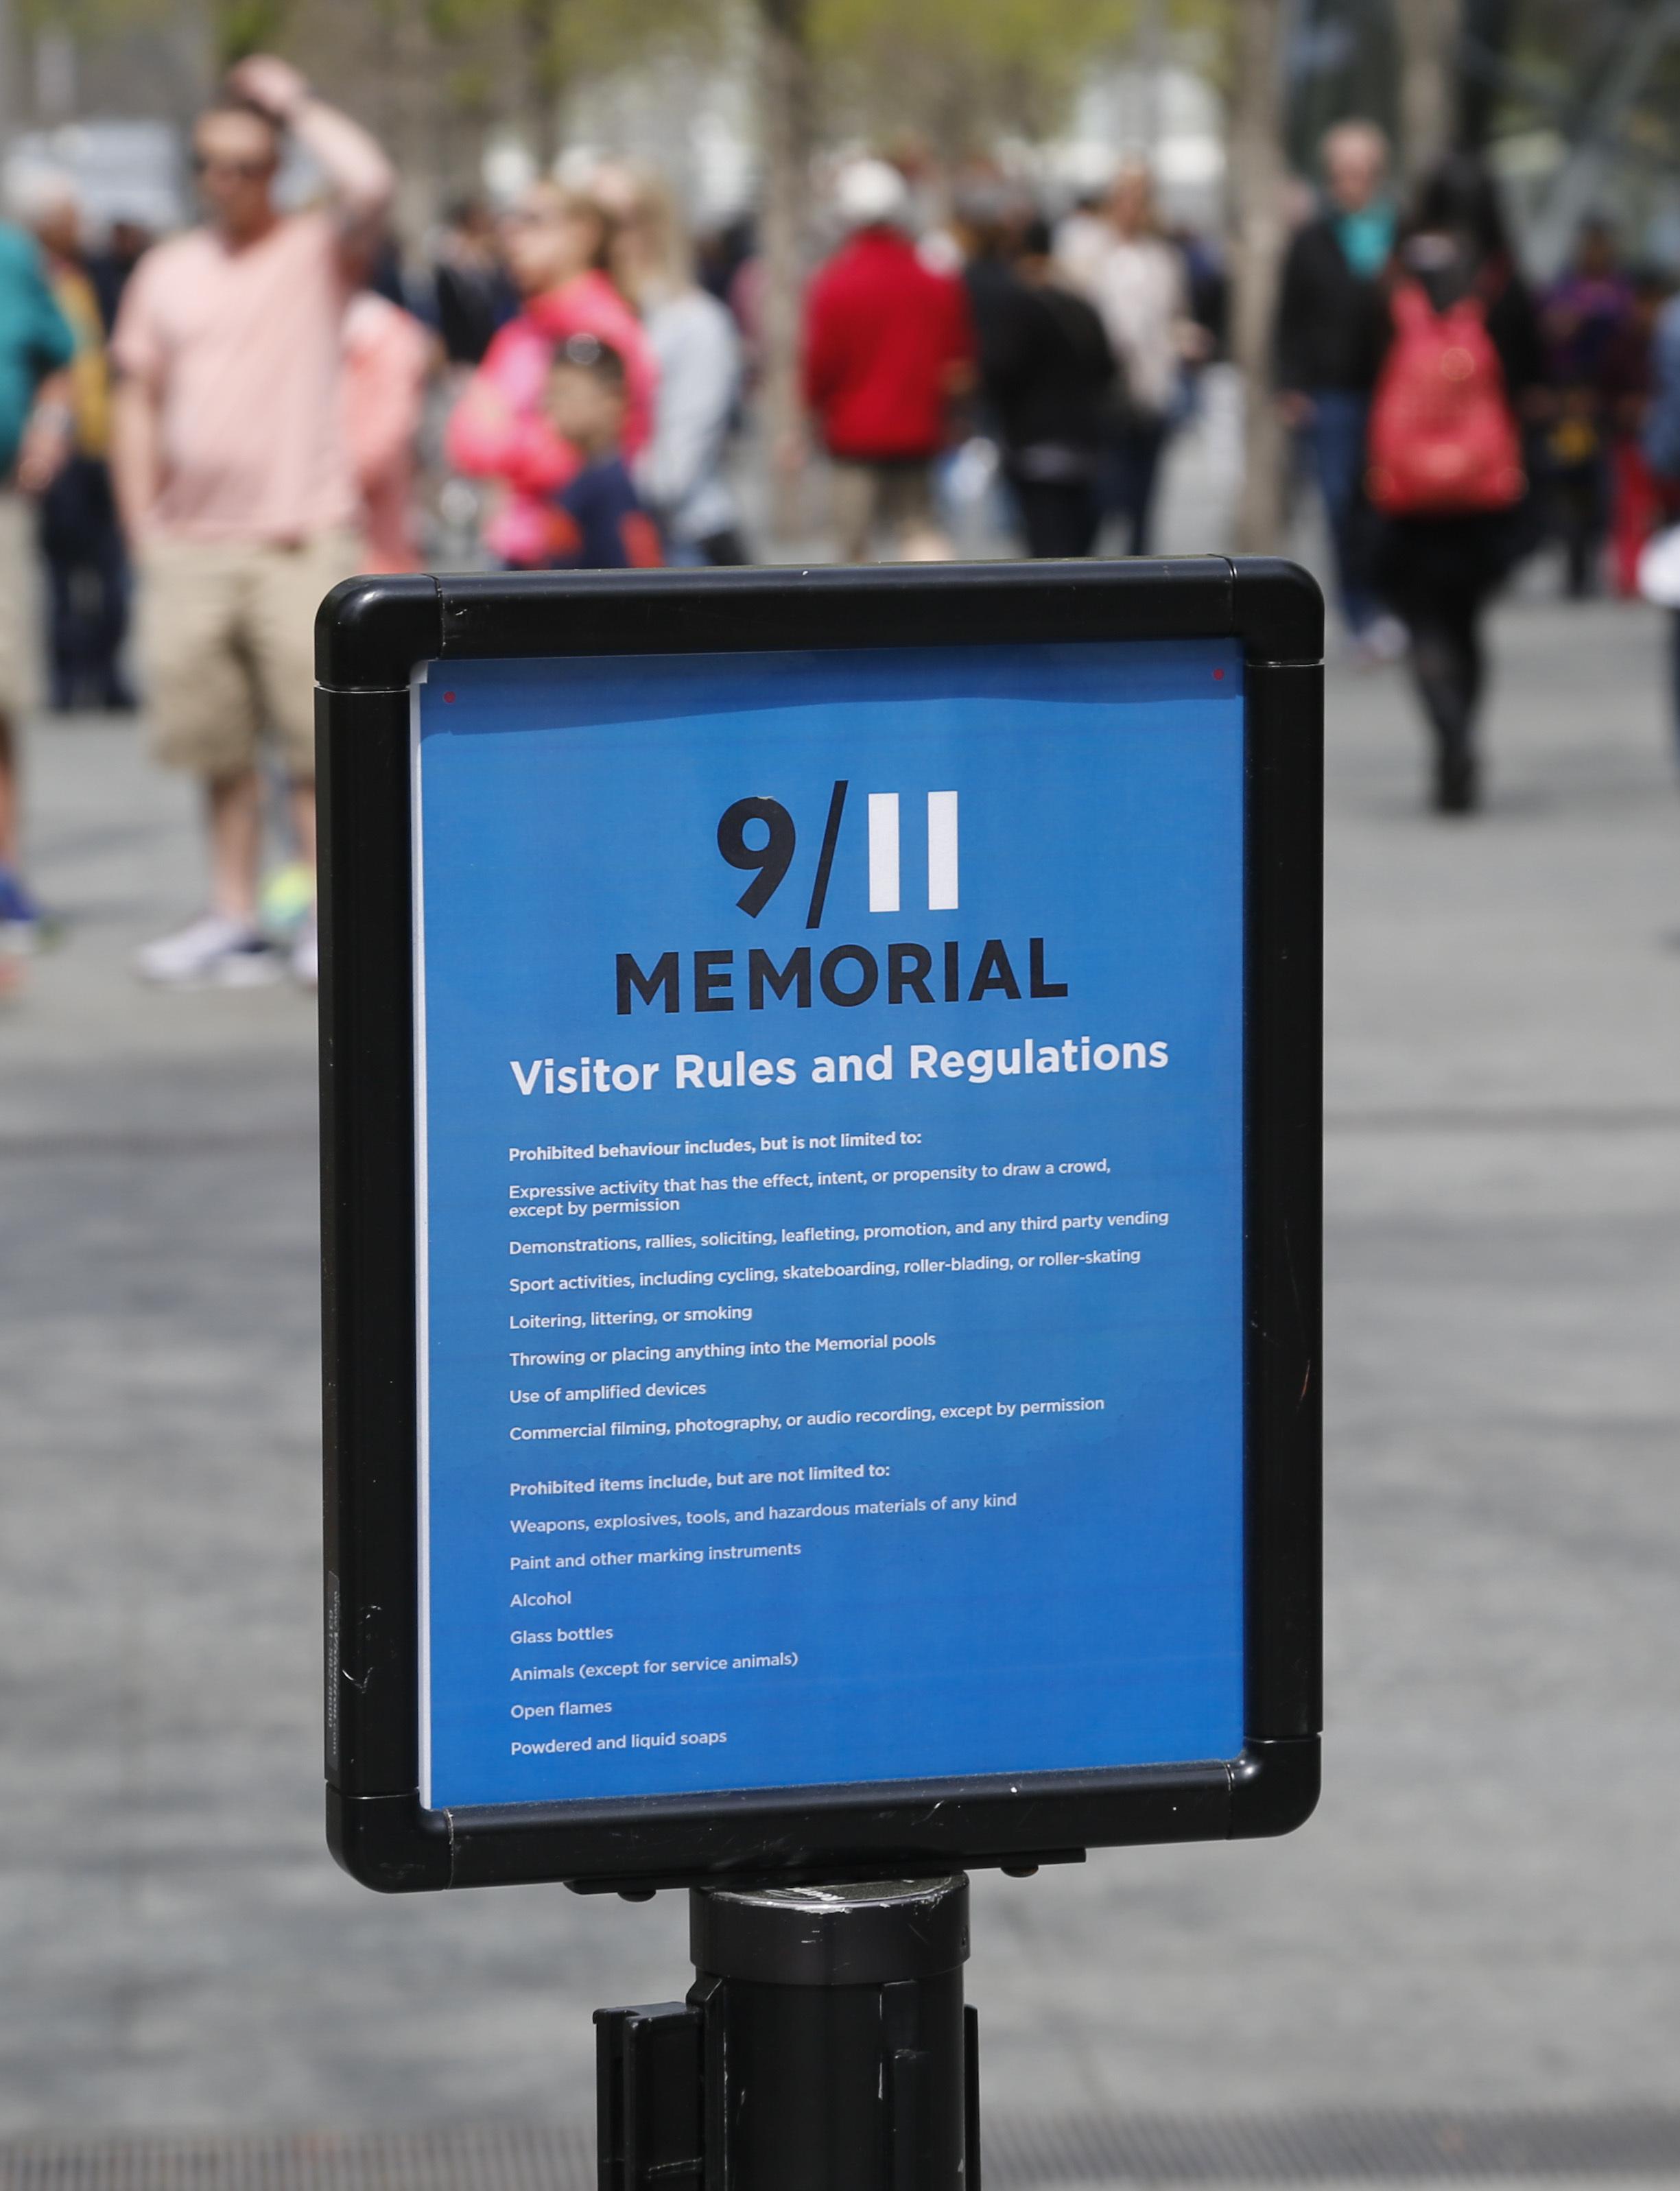 9/11 Memorial: Security Guard Shouldn't Have